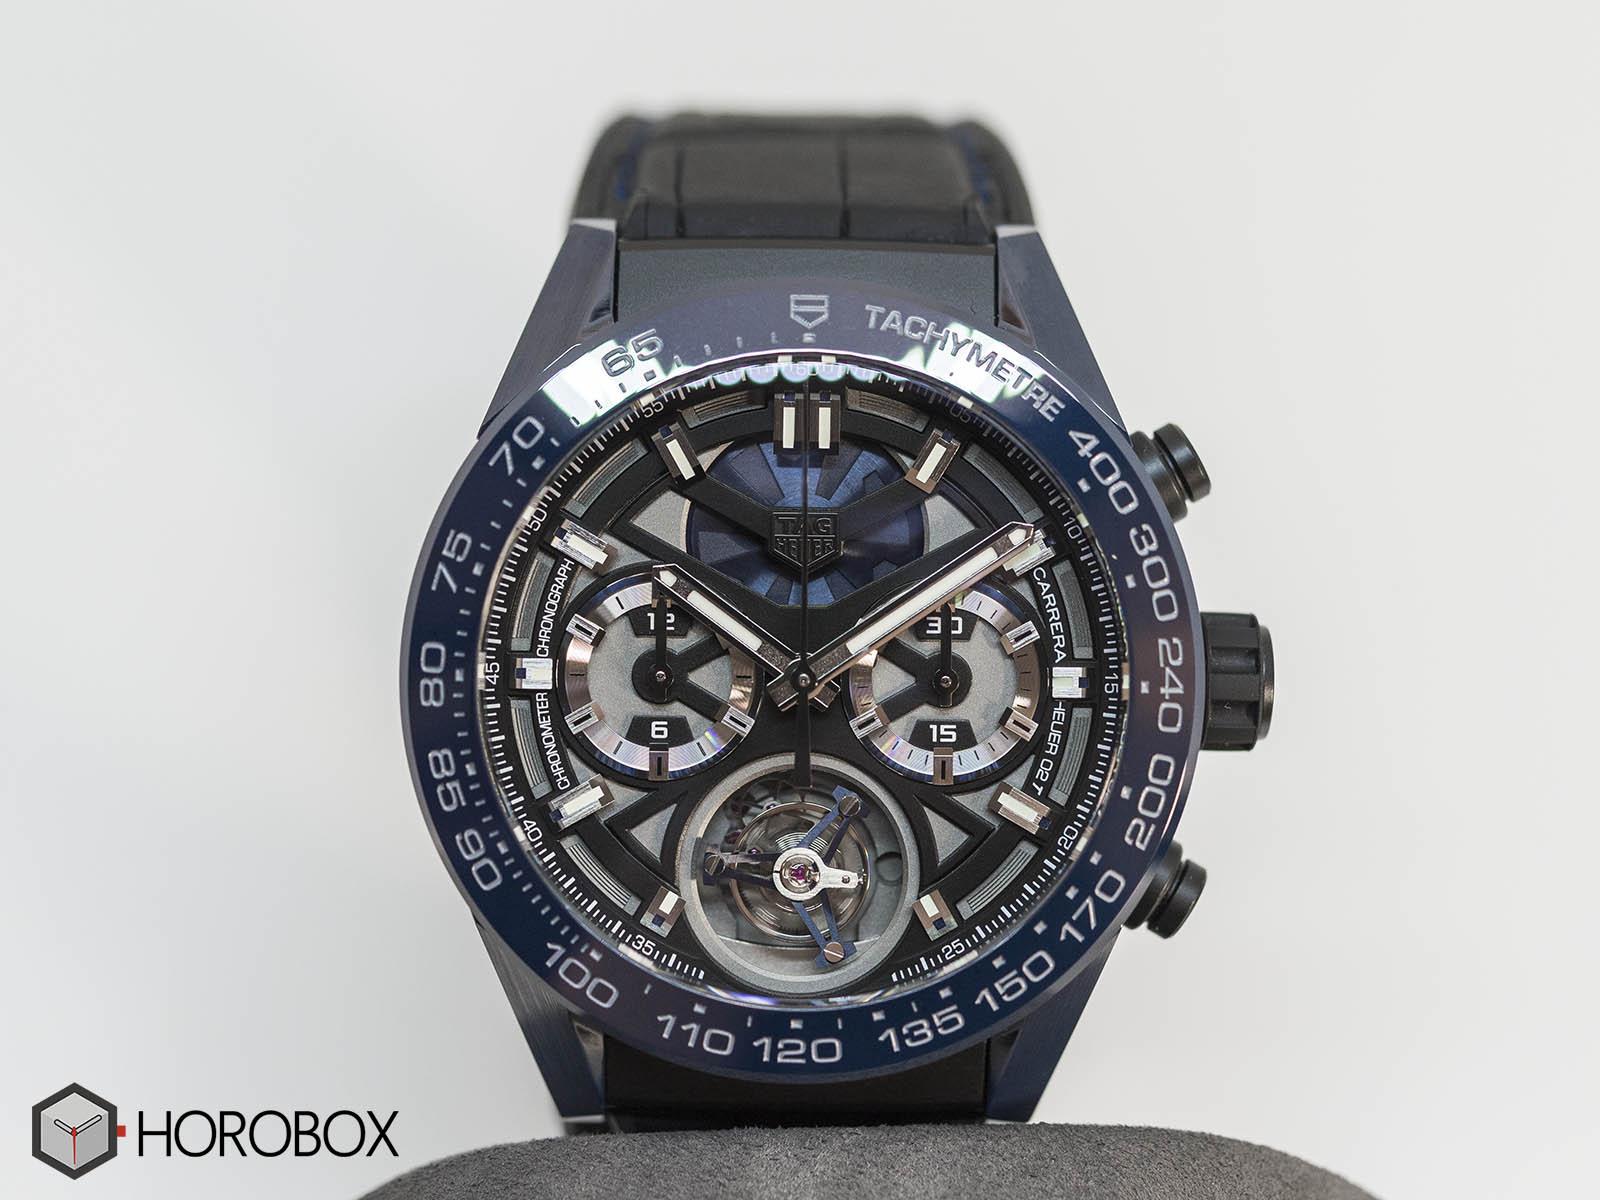 car5a93-fc6442-tag-heuer-carrera-chronograph-tourbillon-chronometer-5.jpg